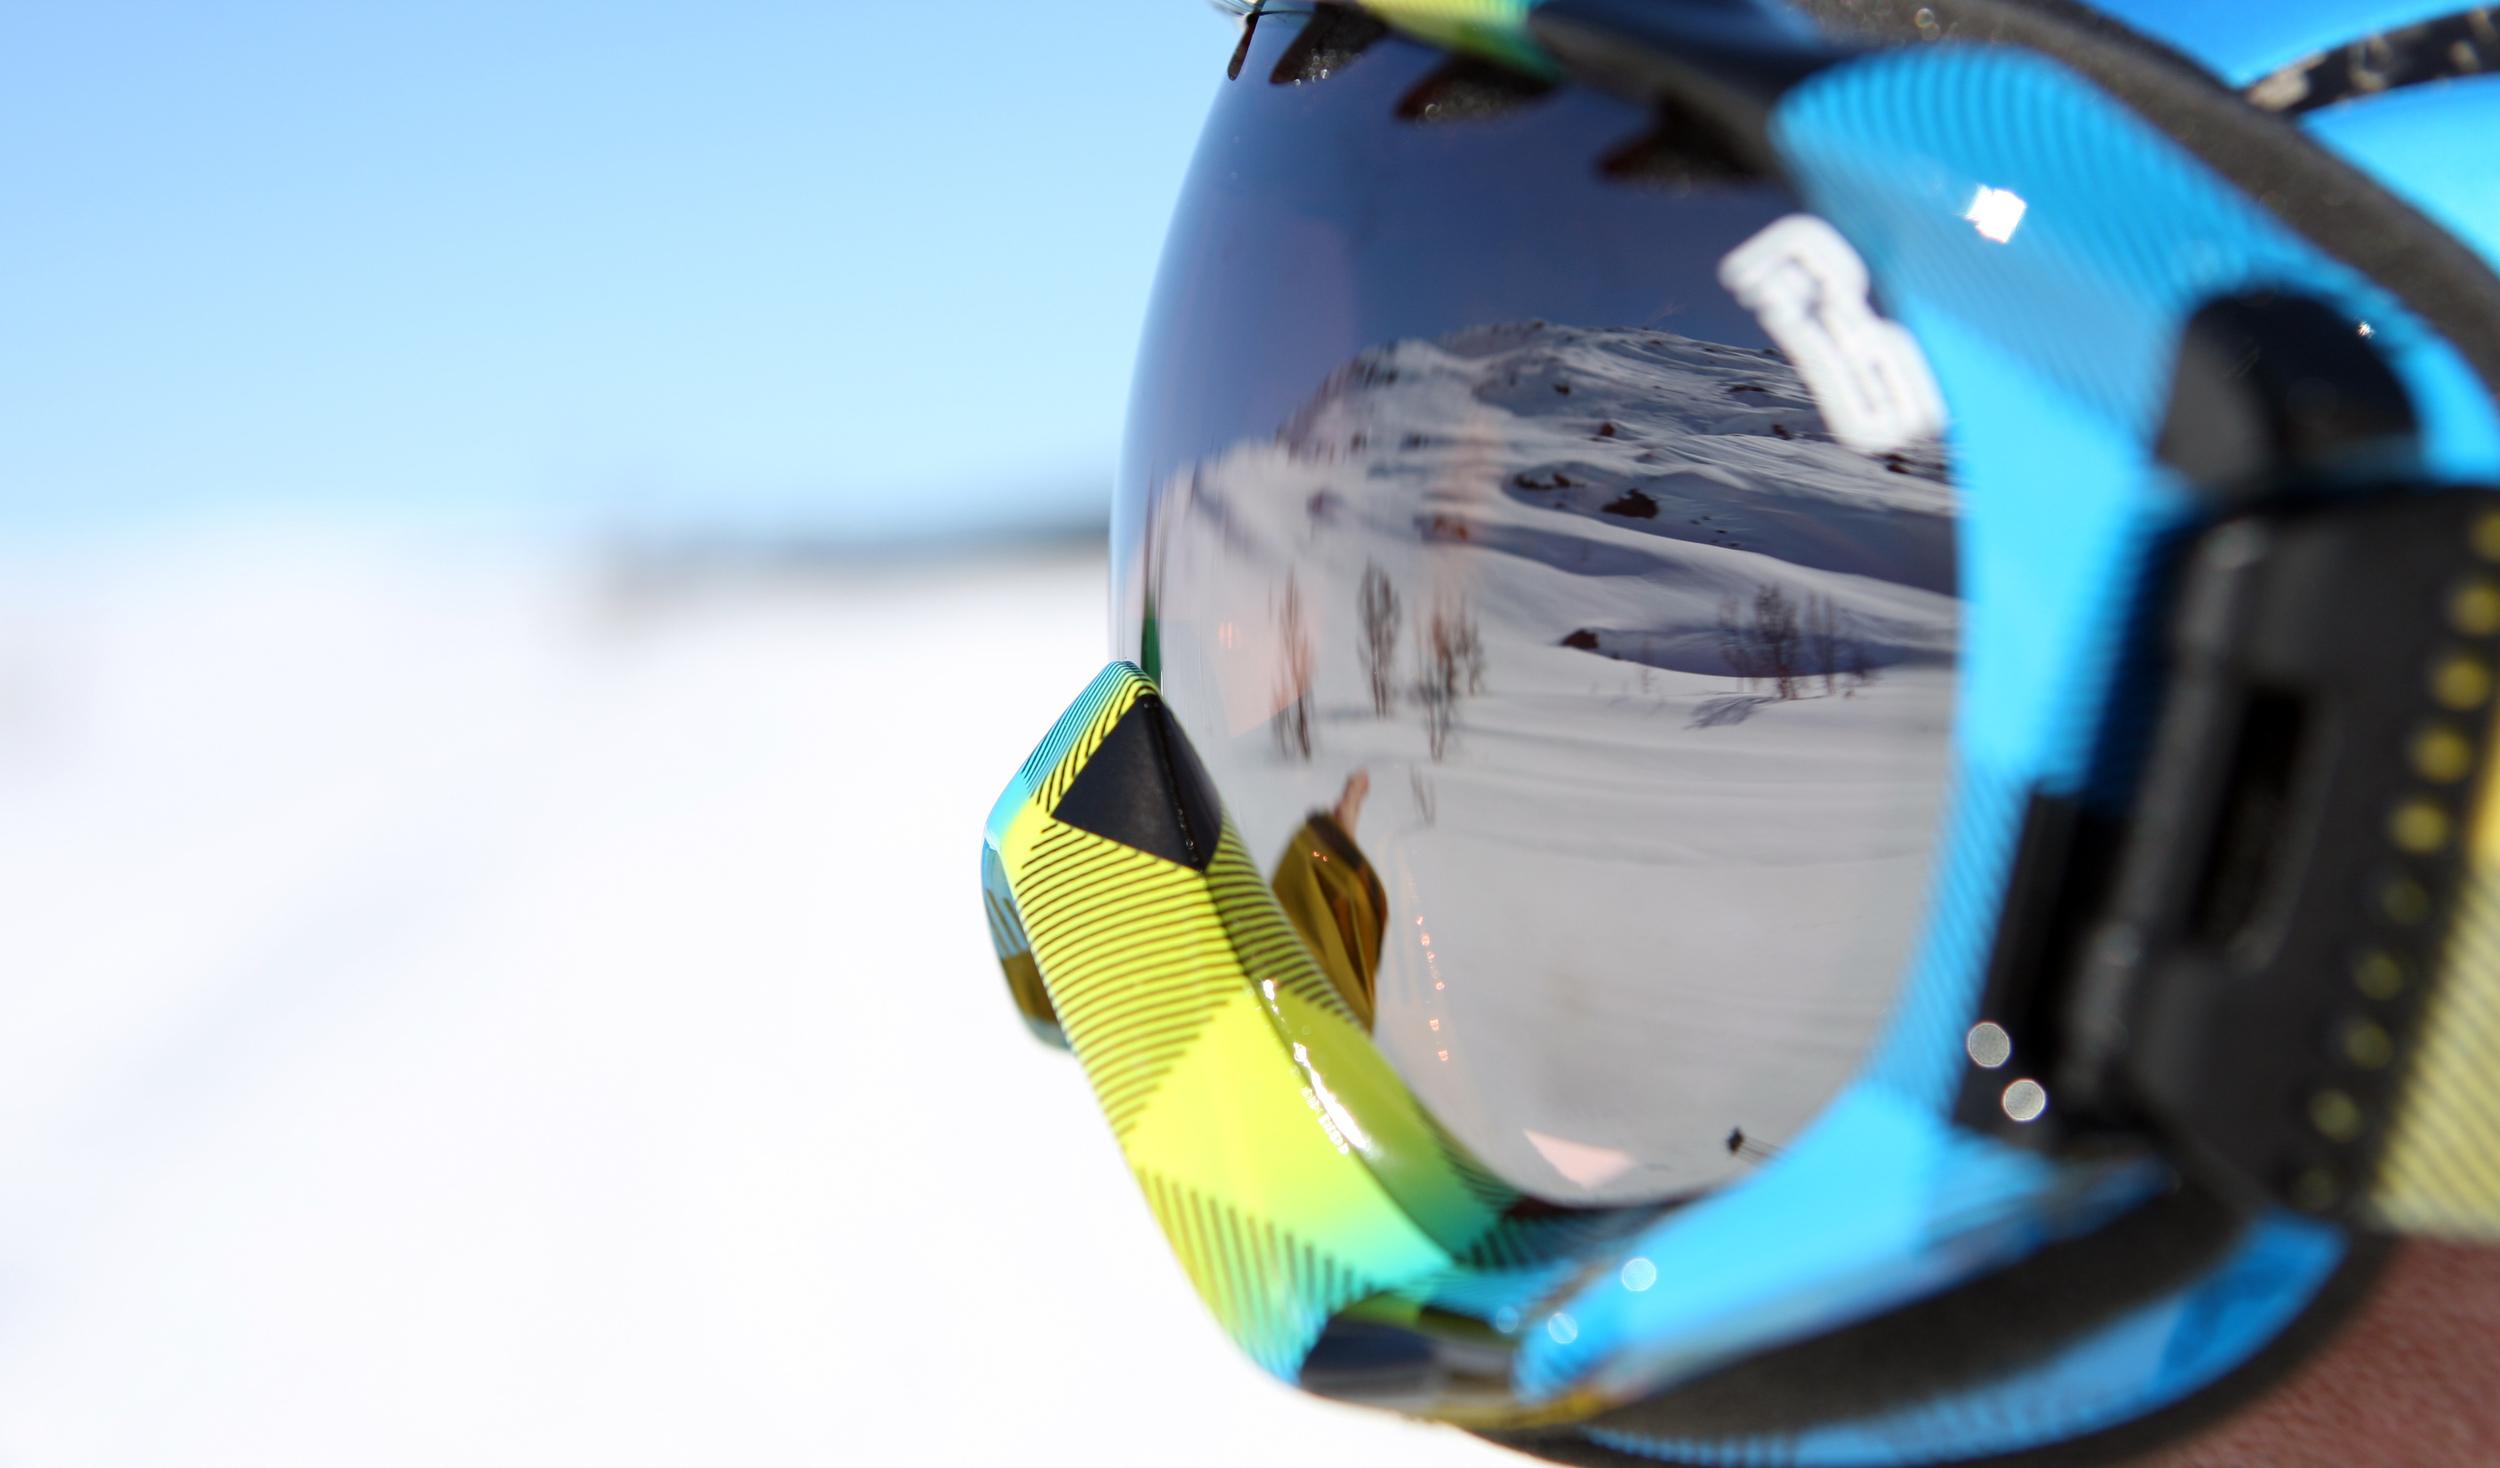 Arctic Ski Catalogue Shoot Sweden2.jpg